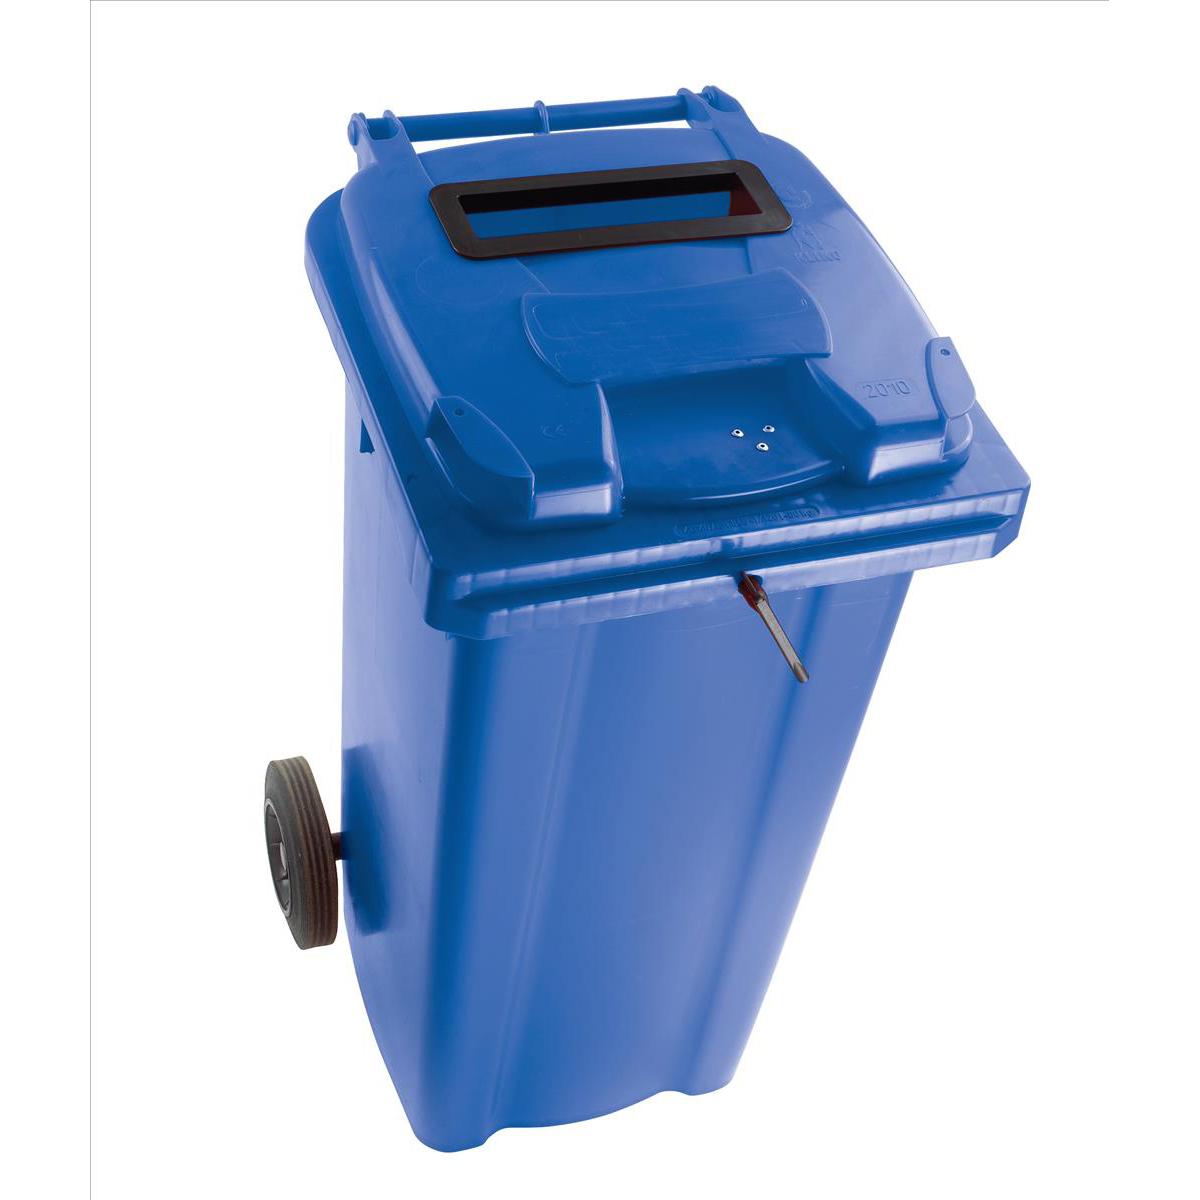 Wheeled Bin UV Stabilised Polyethylene with Rear Wheels Lid Lock 120 Litre Capacity 480x555x930mm Blue